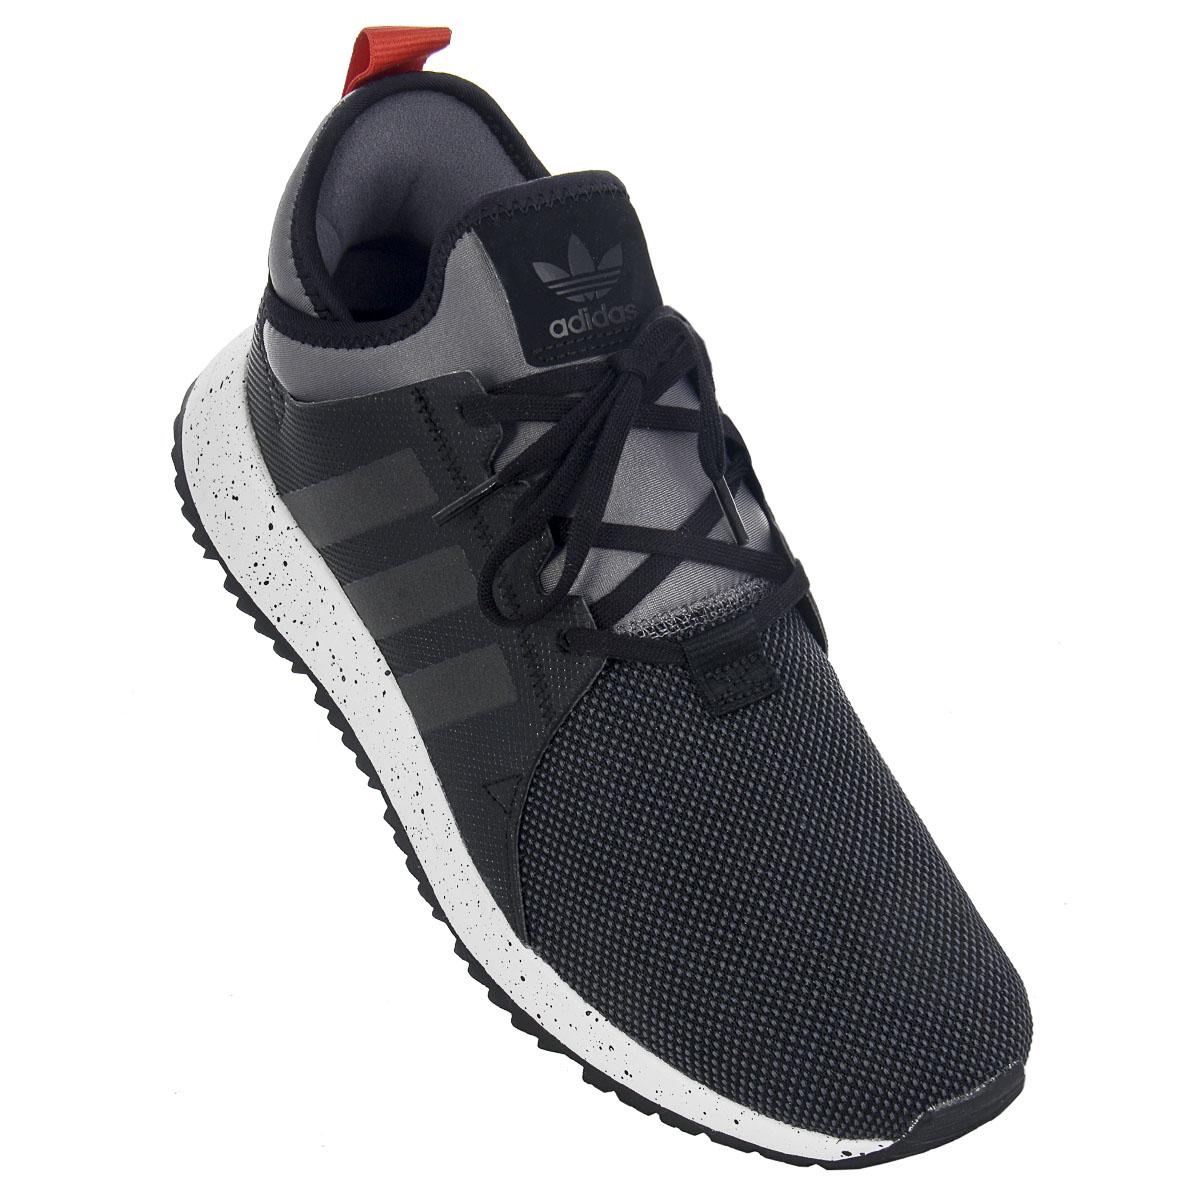 finest selection 3f429 d8f7e ... promo code neu adidas x plr zapatillaboot caballeros zapatos plr  schwarz bz0669 sale 1d9f49 2ecb9 c6a11